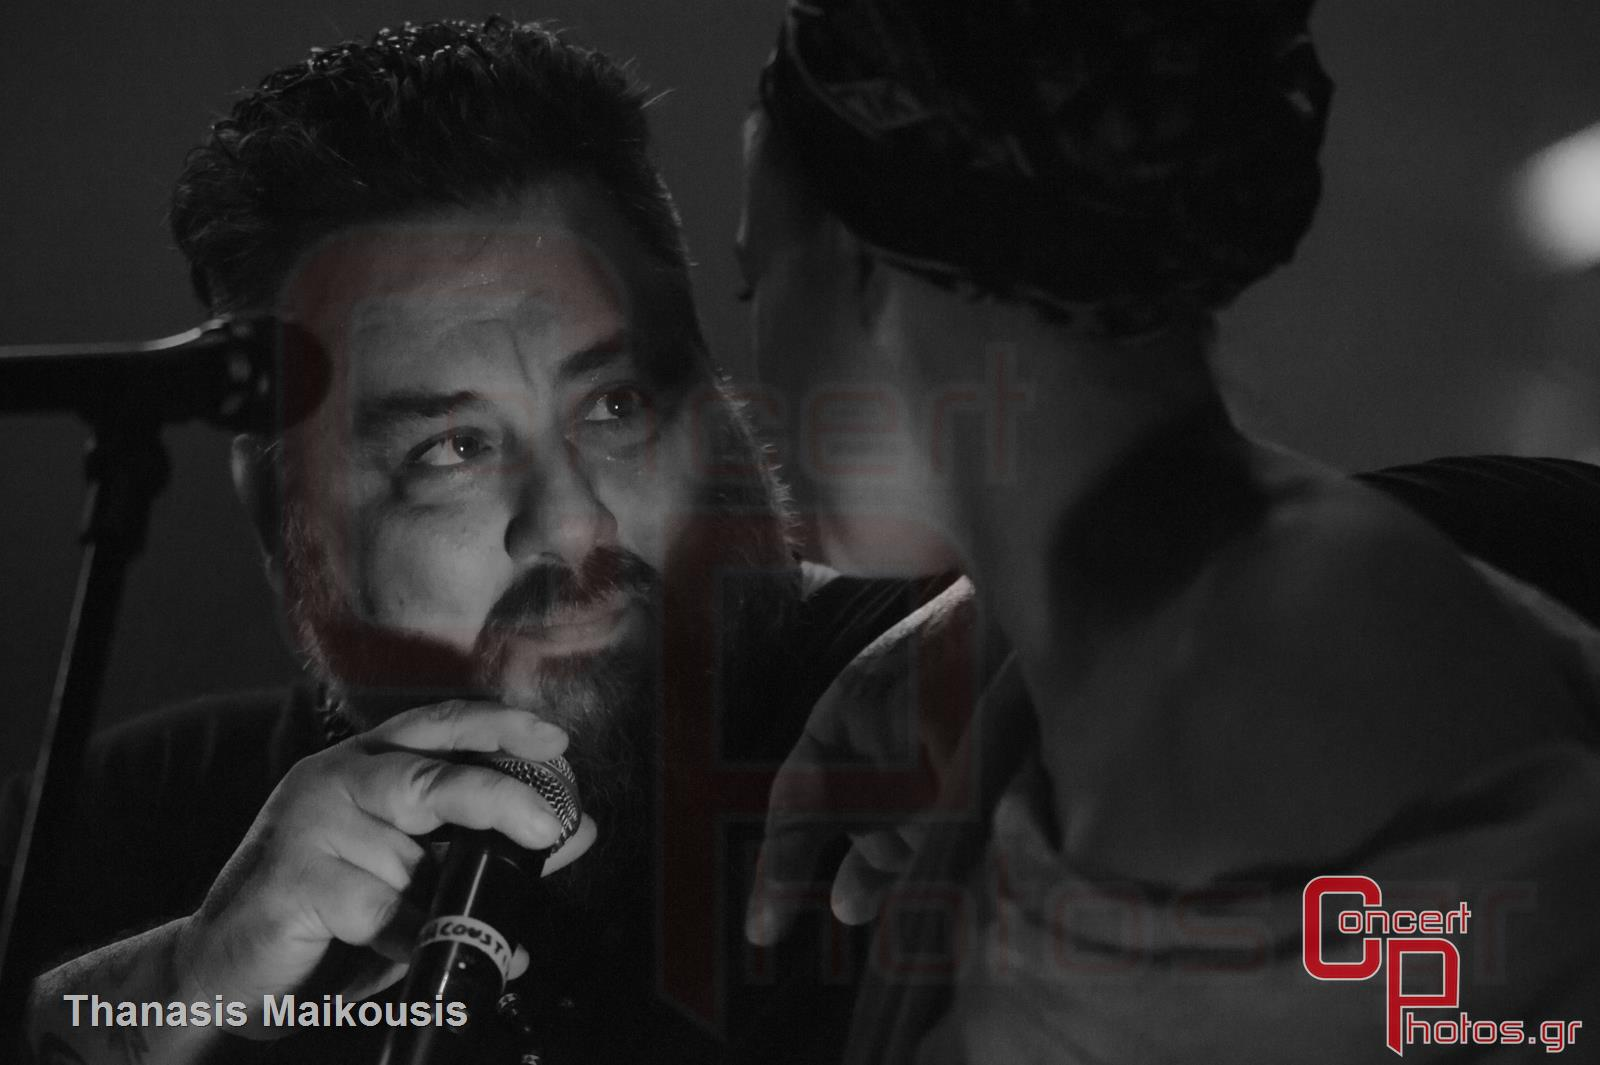 Active Member - Τραγούδα μας να φύγει το σκοτάδι- photographer: Thanasis Maikousis - concertphotos_-4964